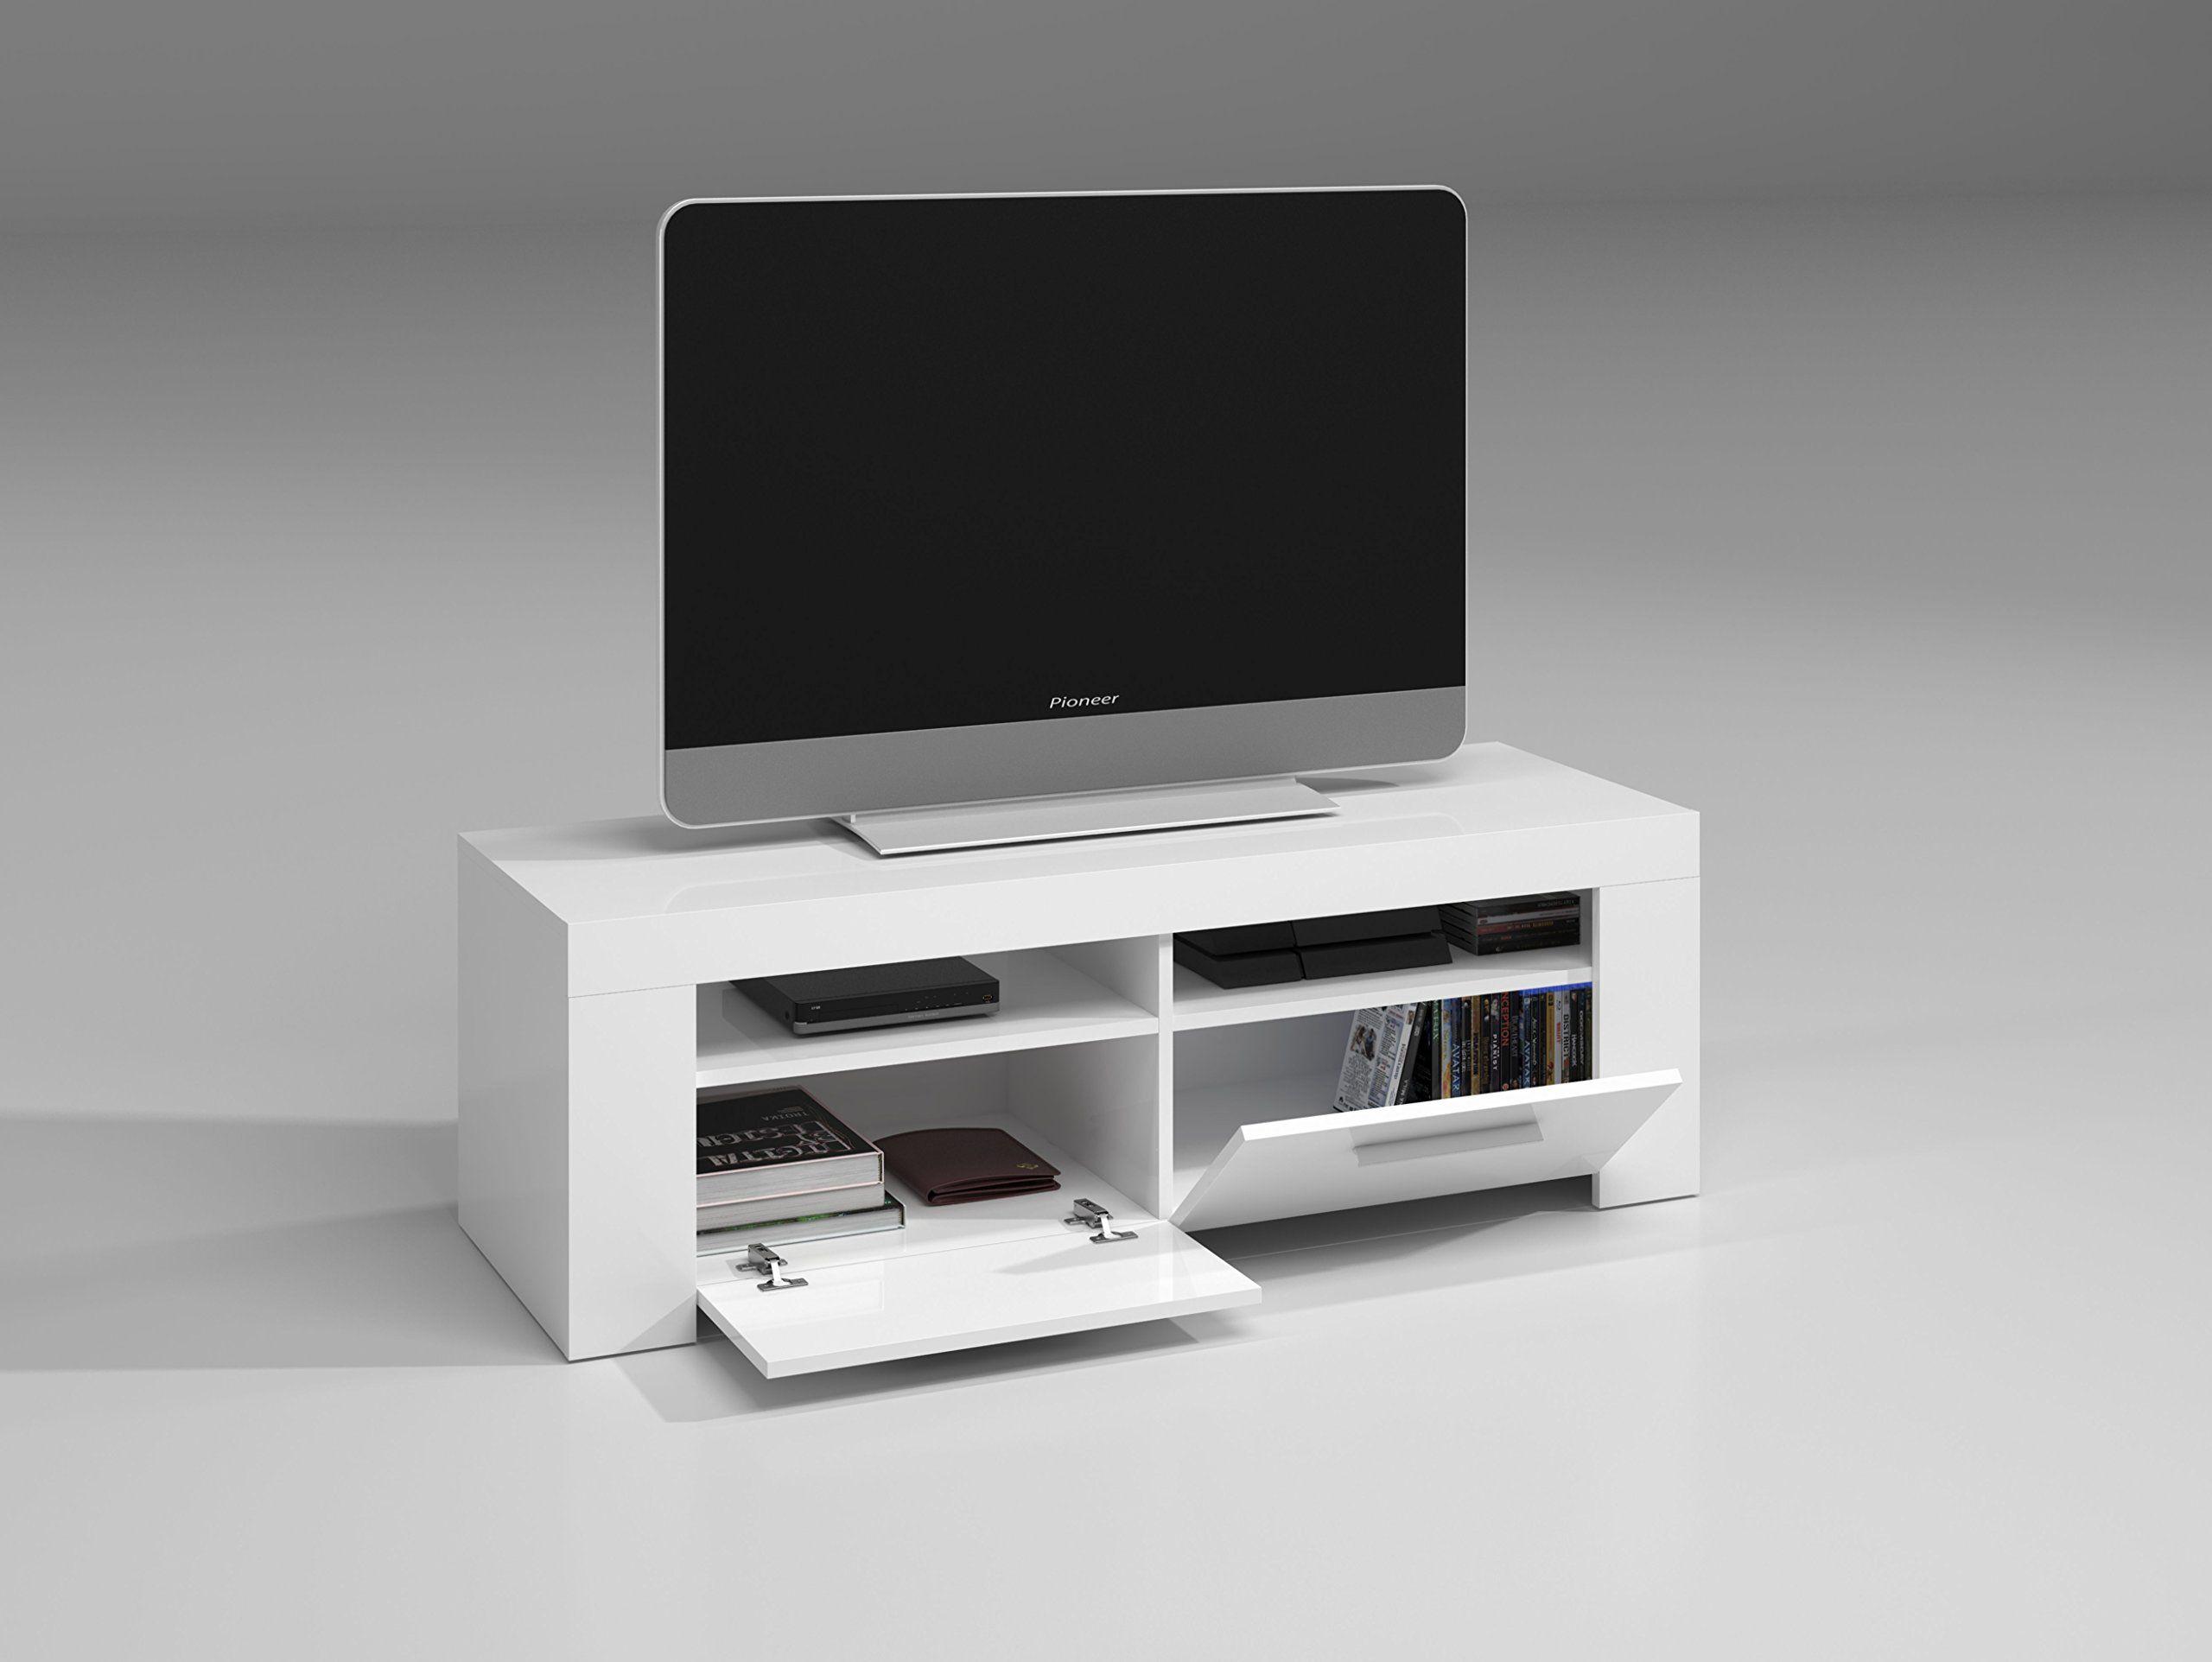 Habitdesign 006621bo mueble de comedor moderno color for Mobiliario vintage barato